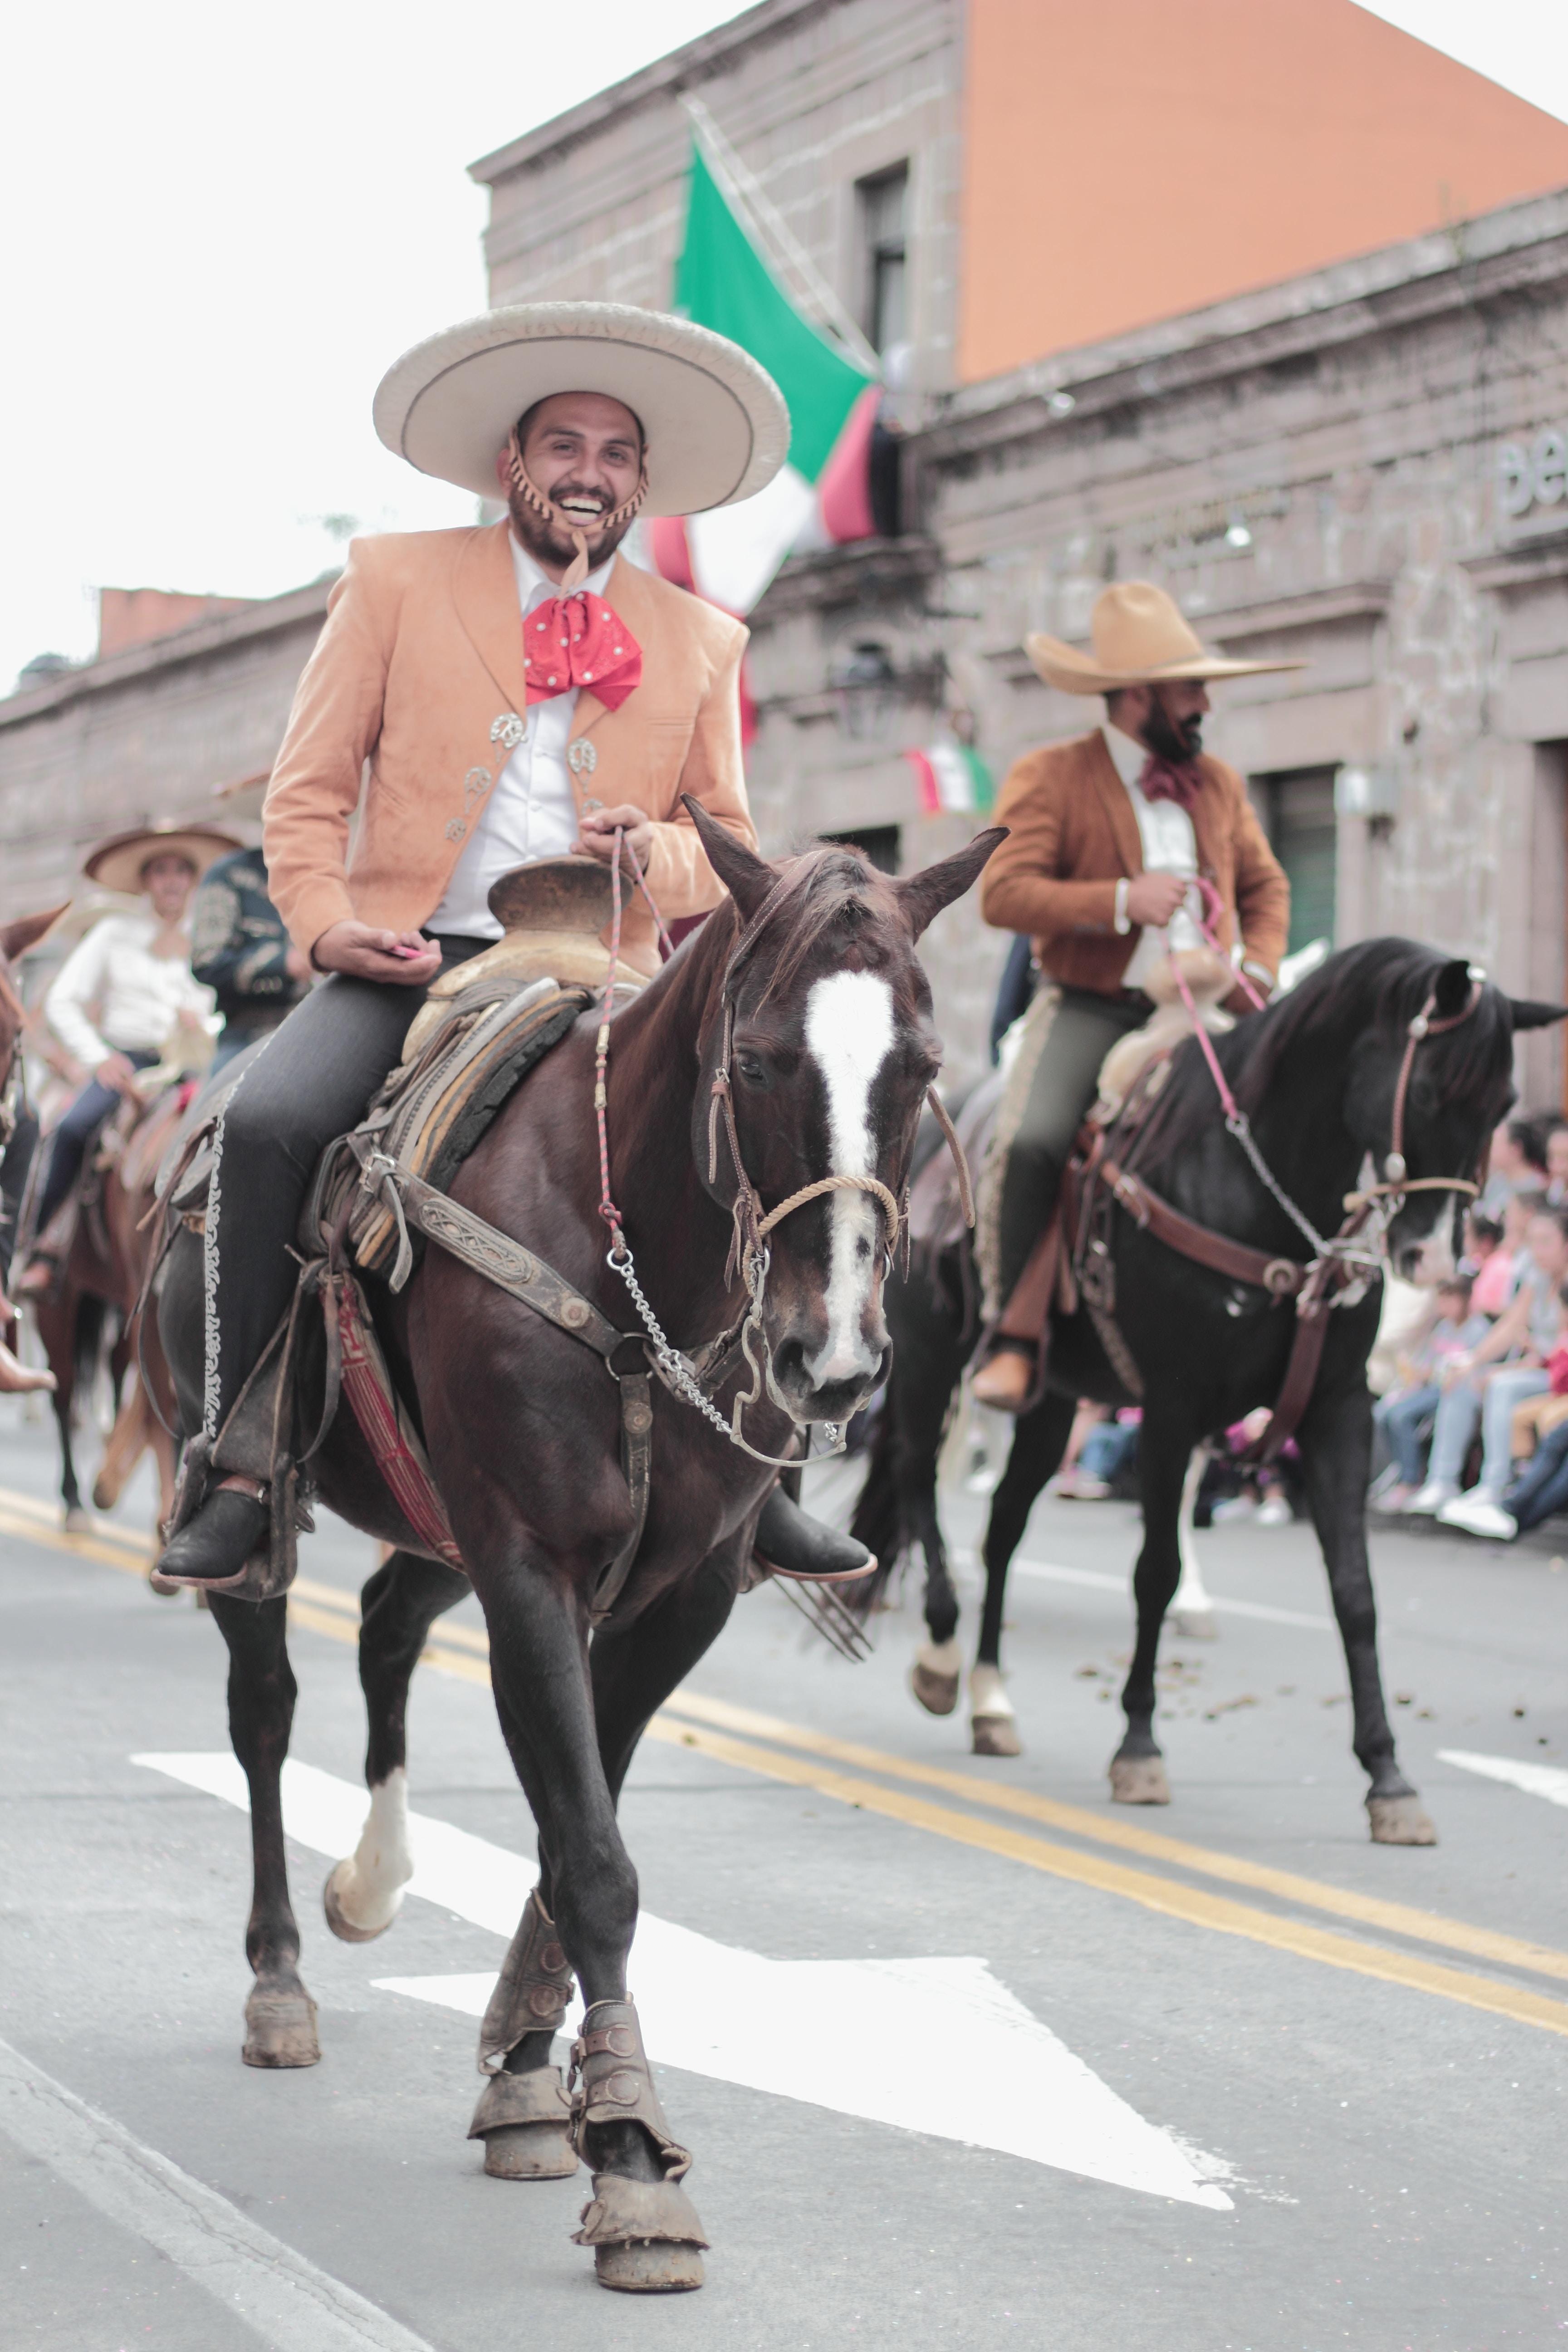 man wearing sumbrero riding horse